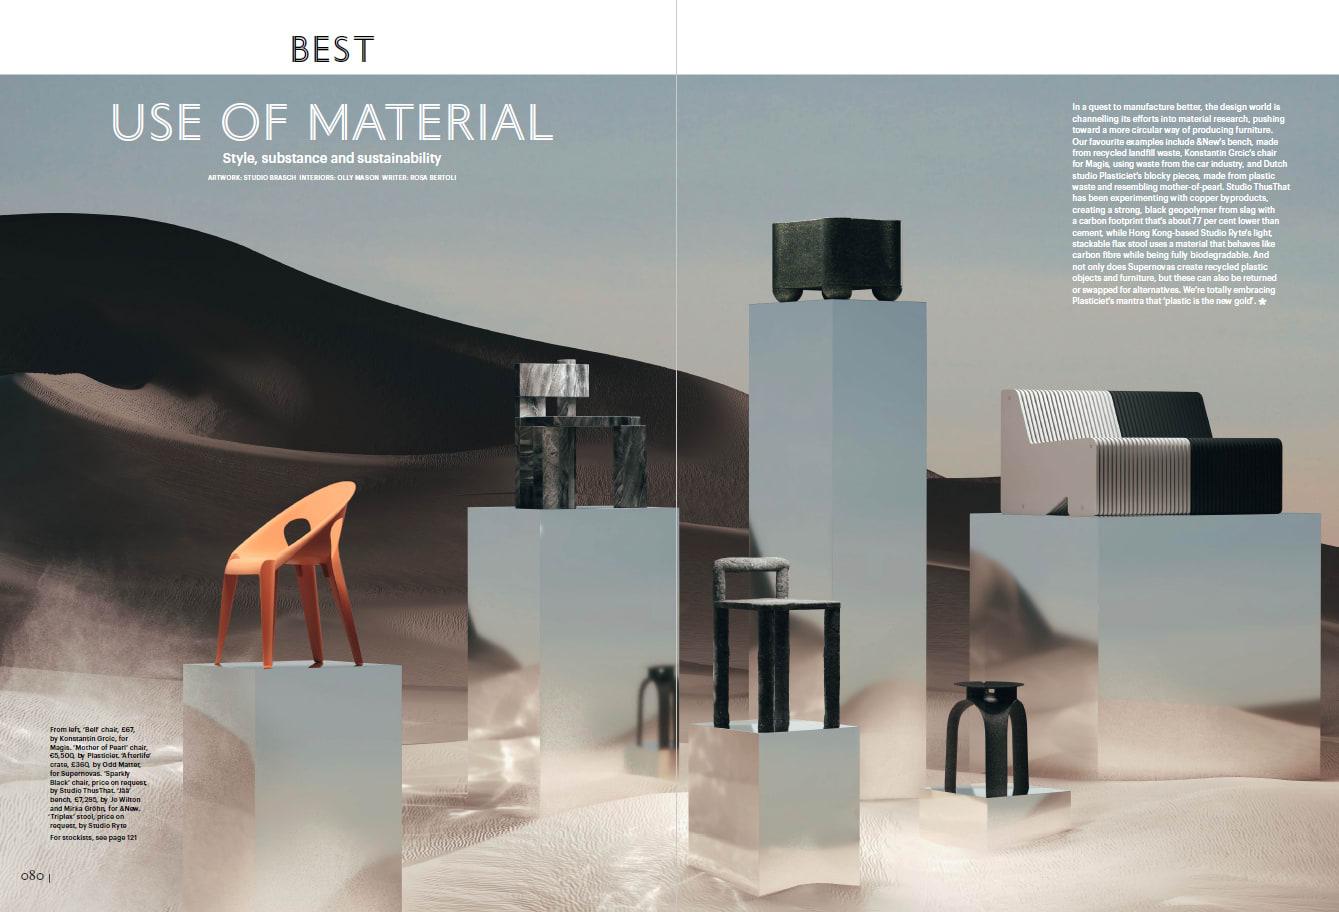 Wallpaper* Design Awards 2021